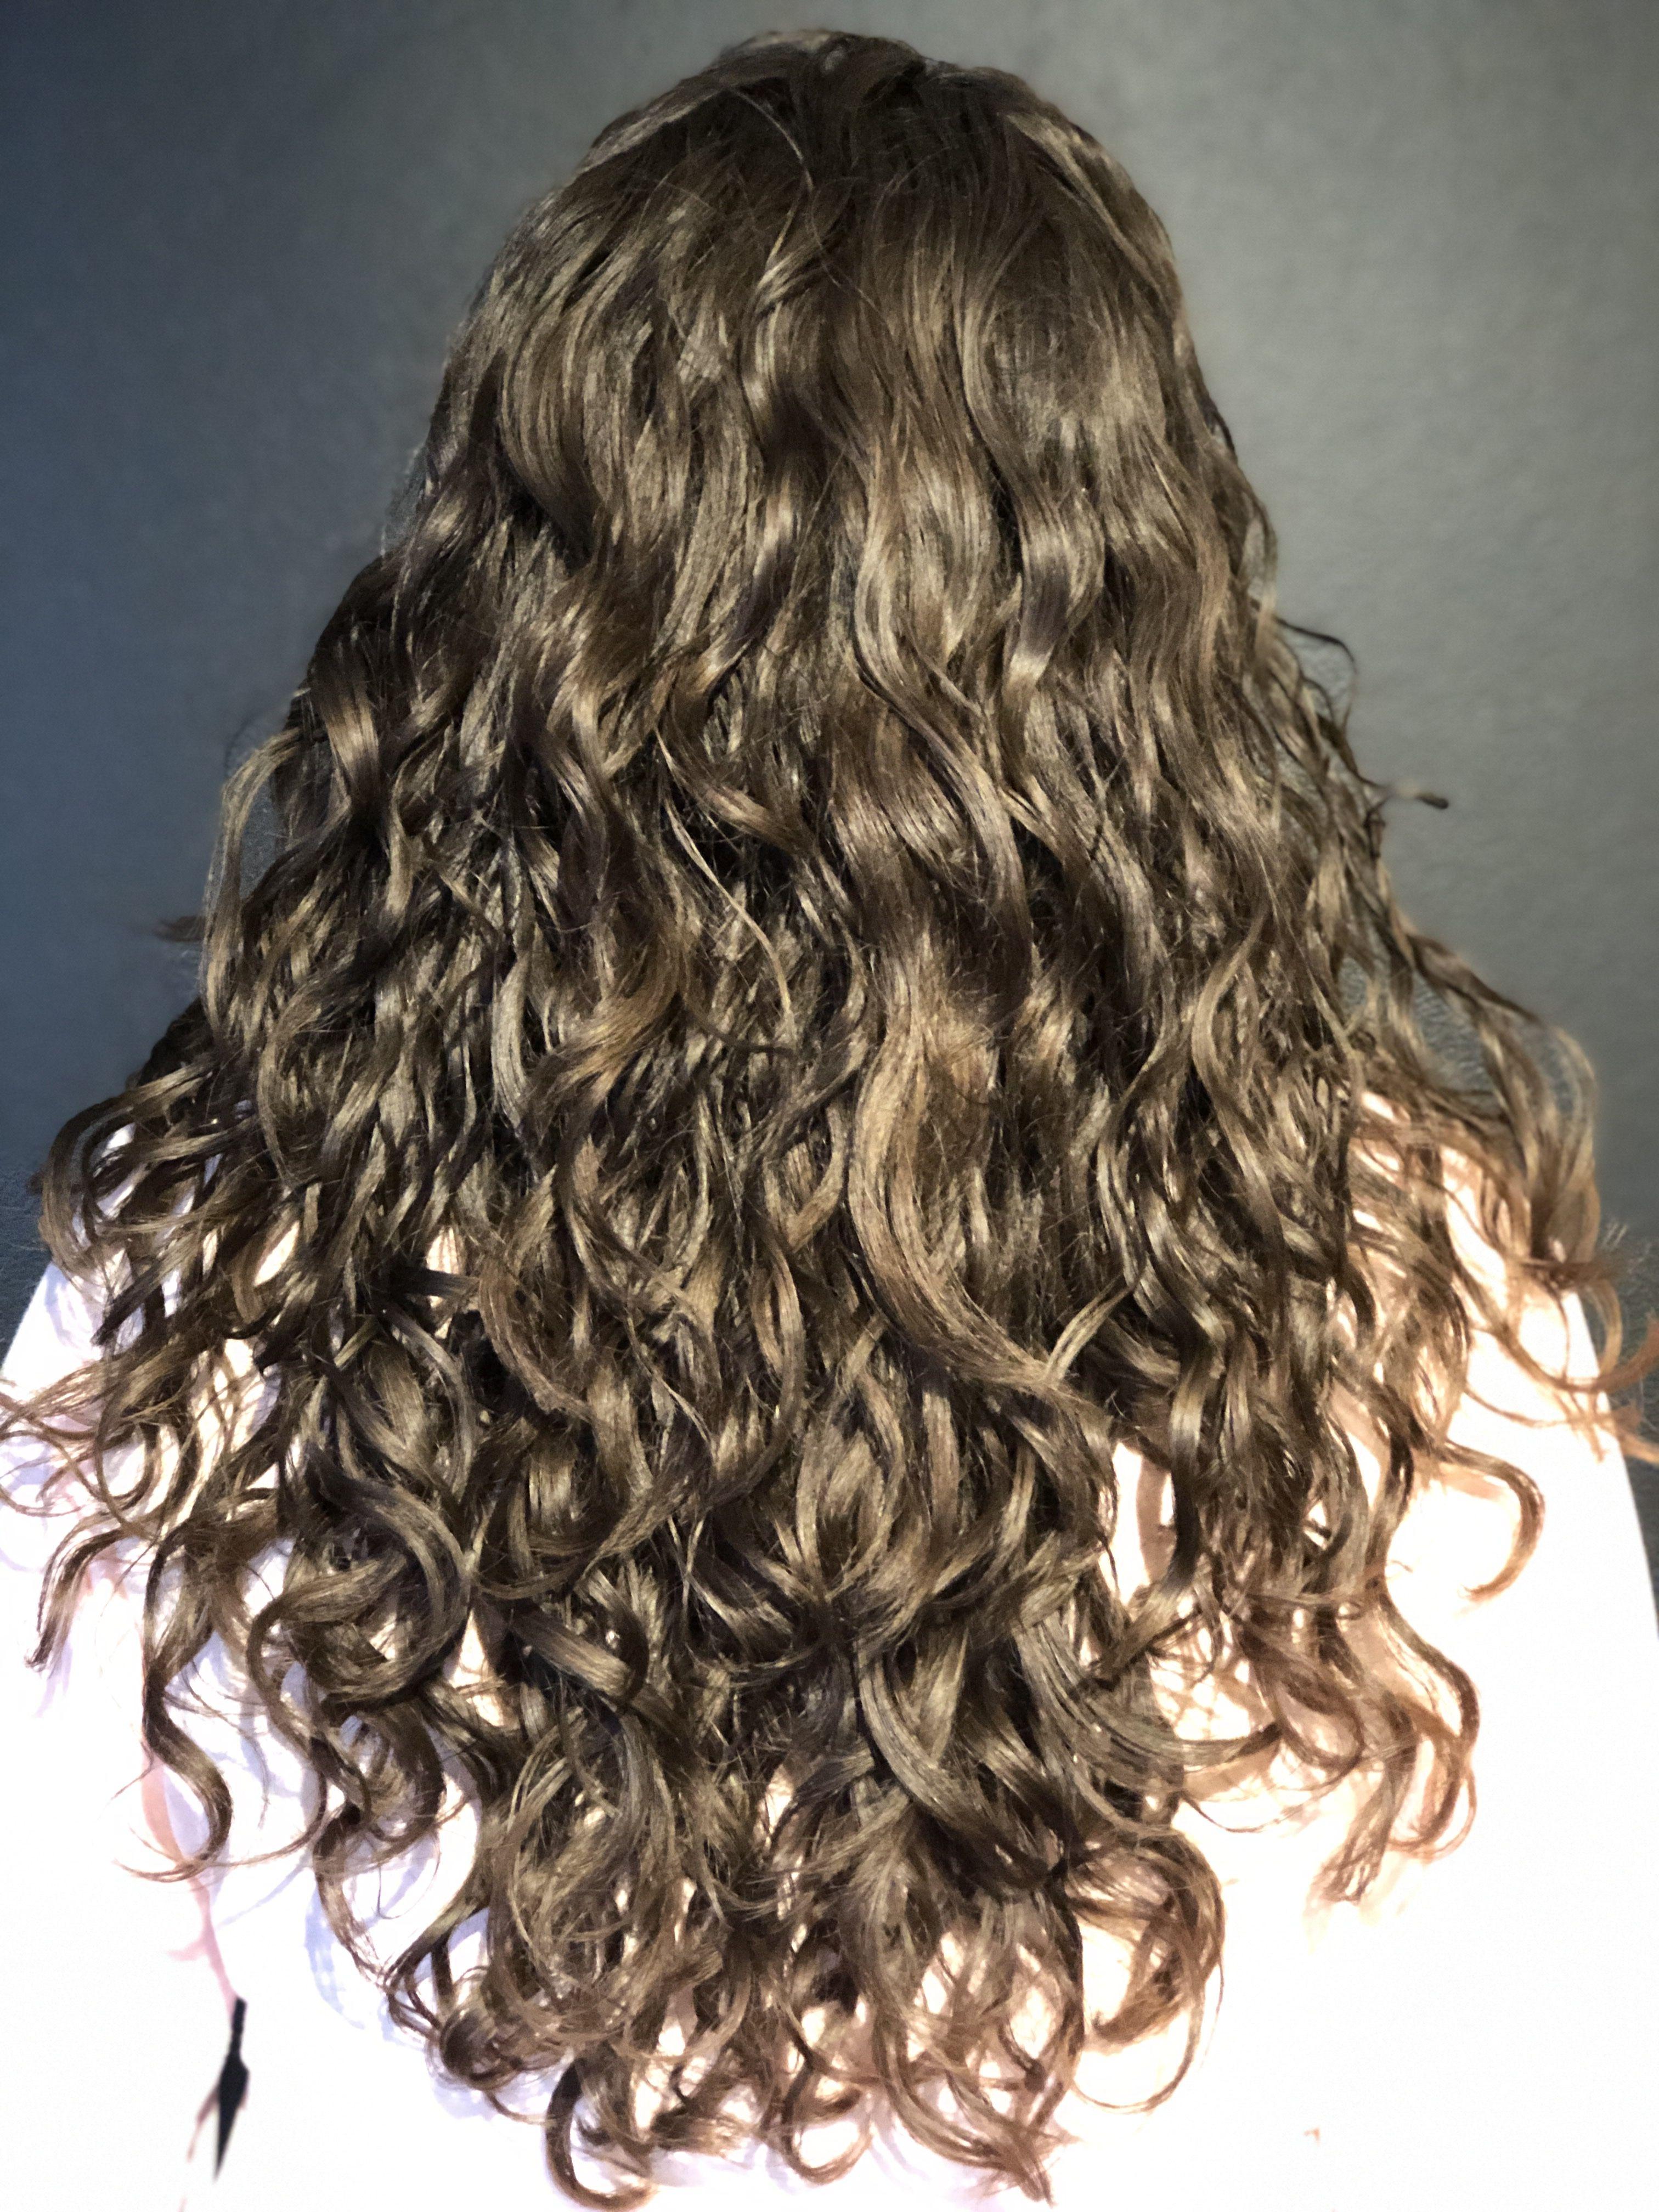 Ouidad By Adored Salon Curly Hair Salon Curly Hair Styles Hair